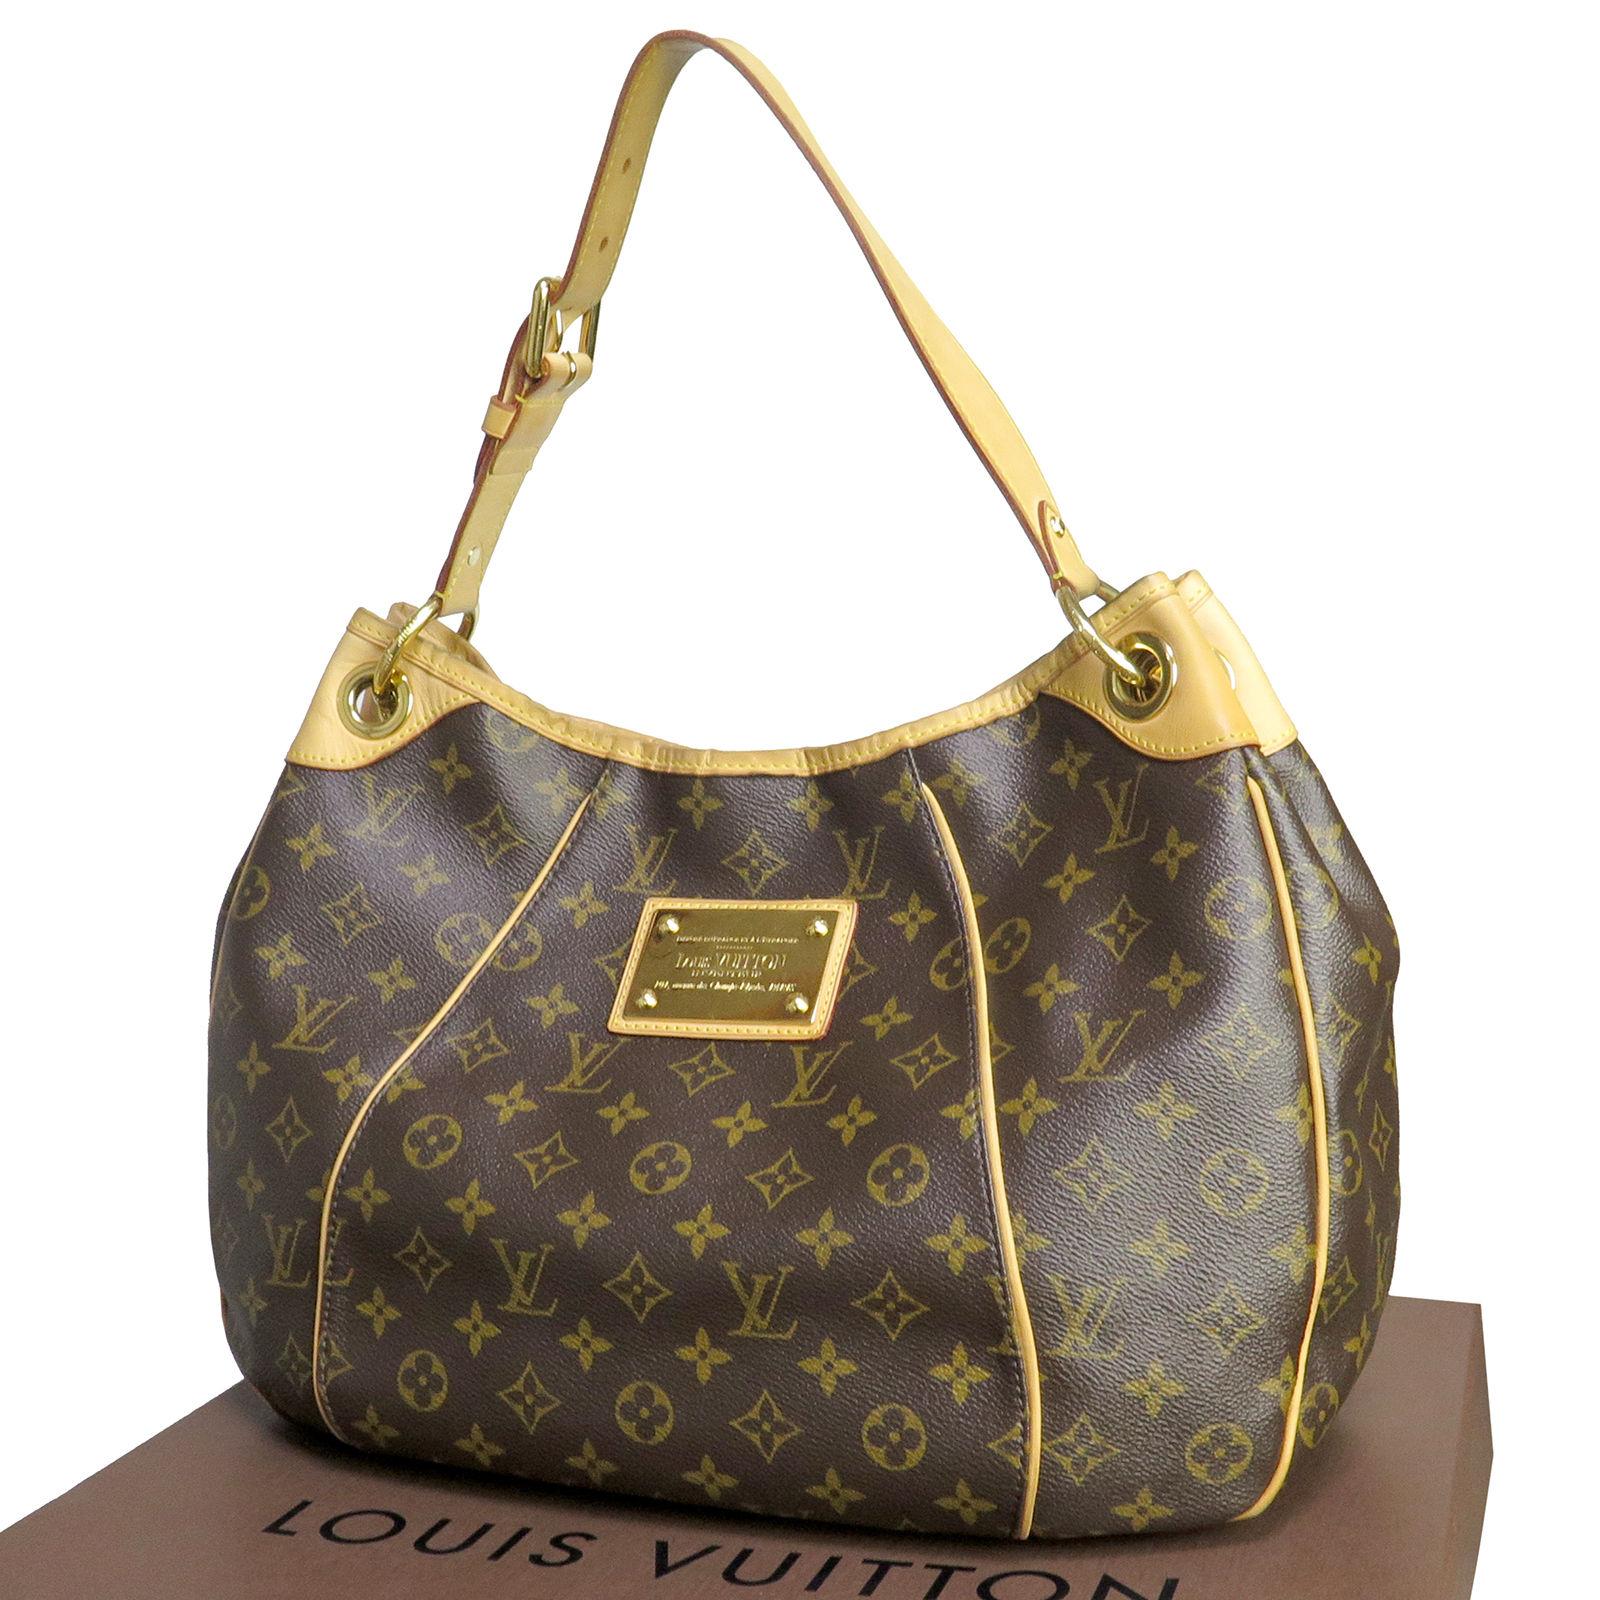 a18b0dde5794 LOUIS VUITTON Monogram Canvas Galliera Pm Shoulder Bag - My Frugal ...